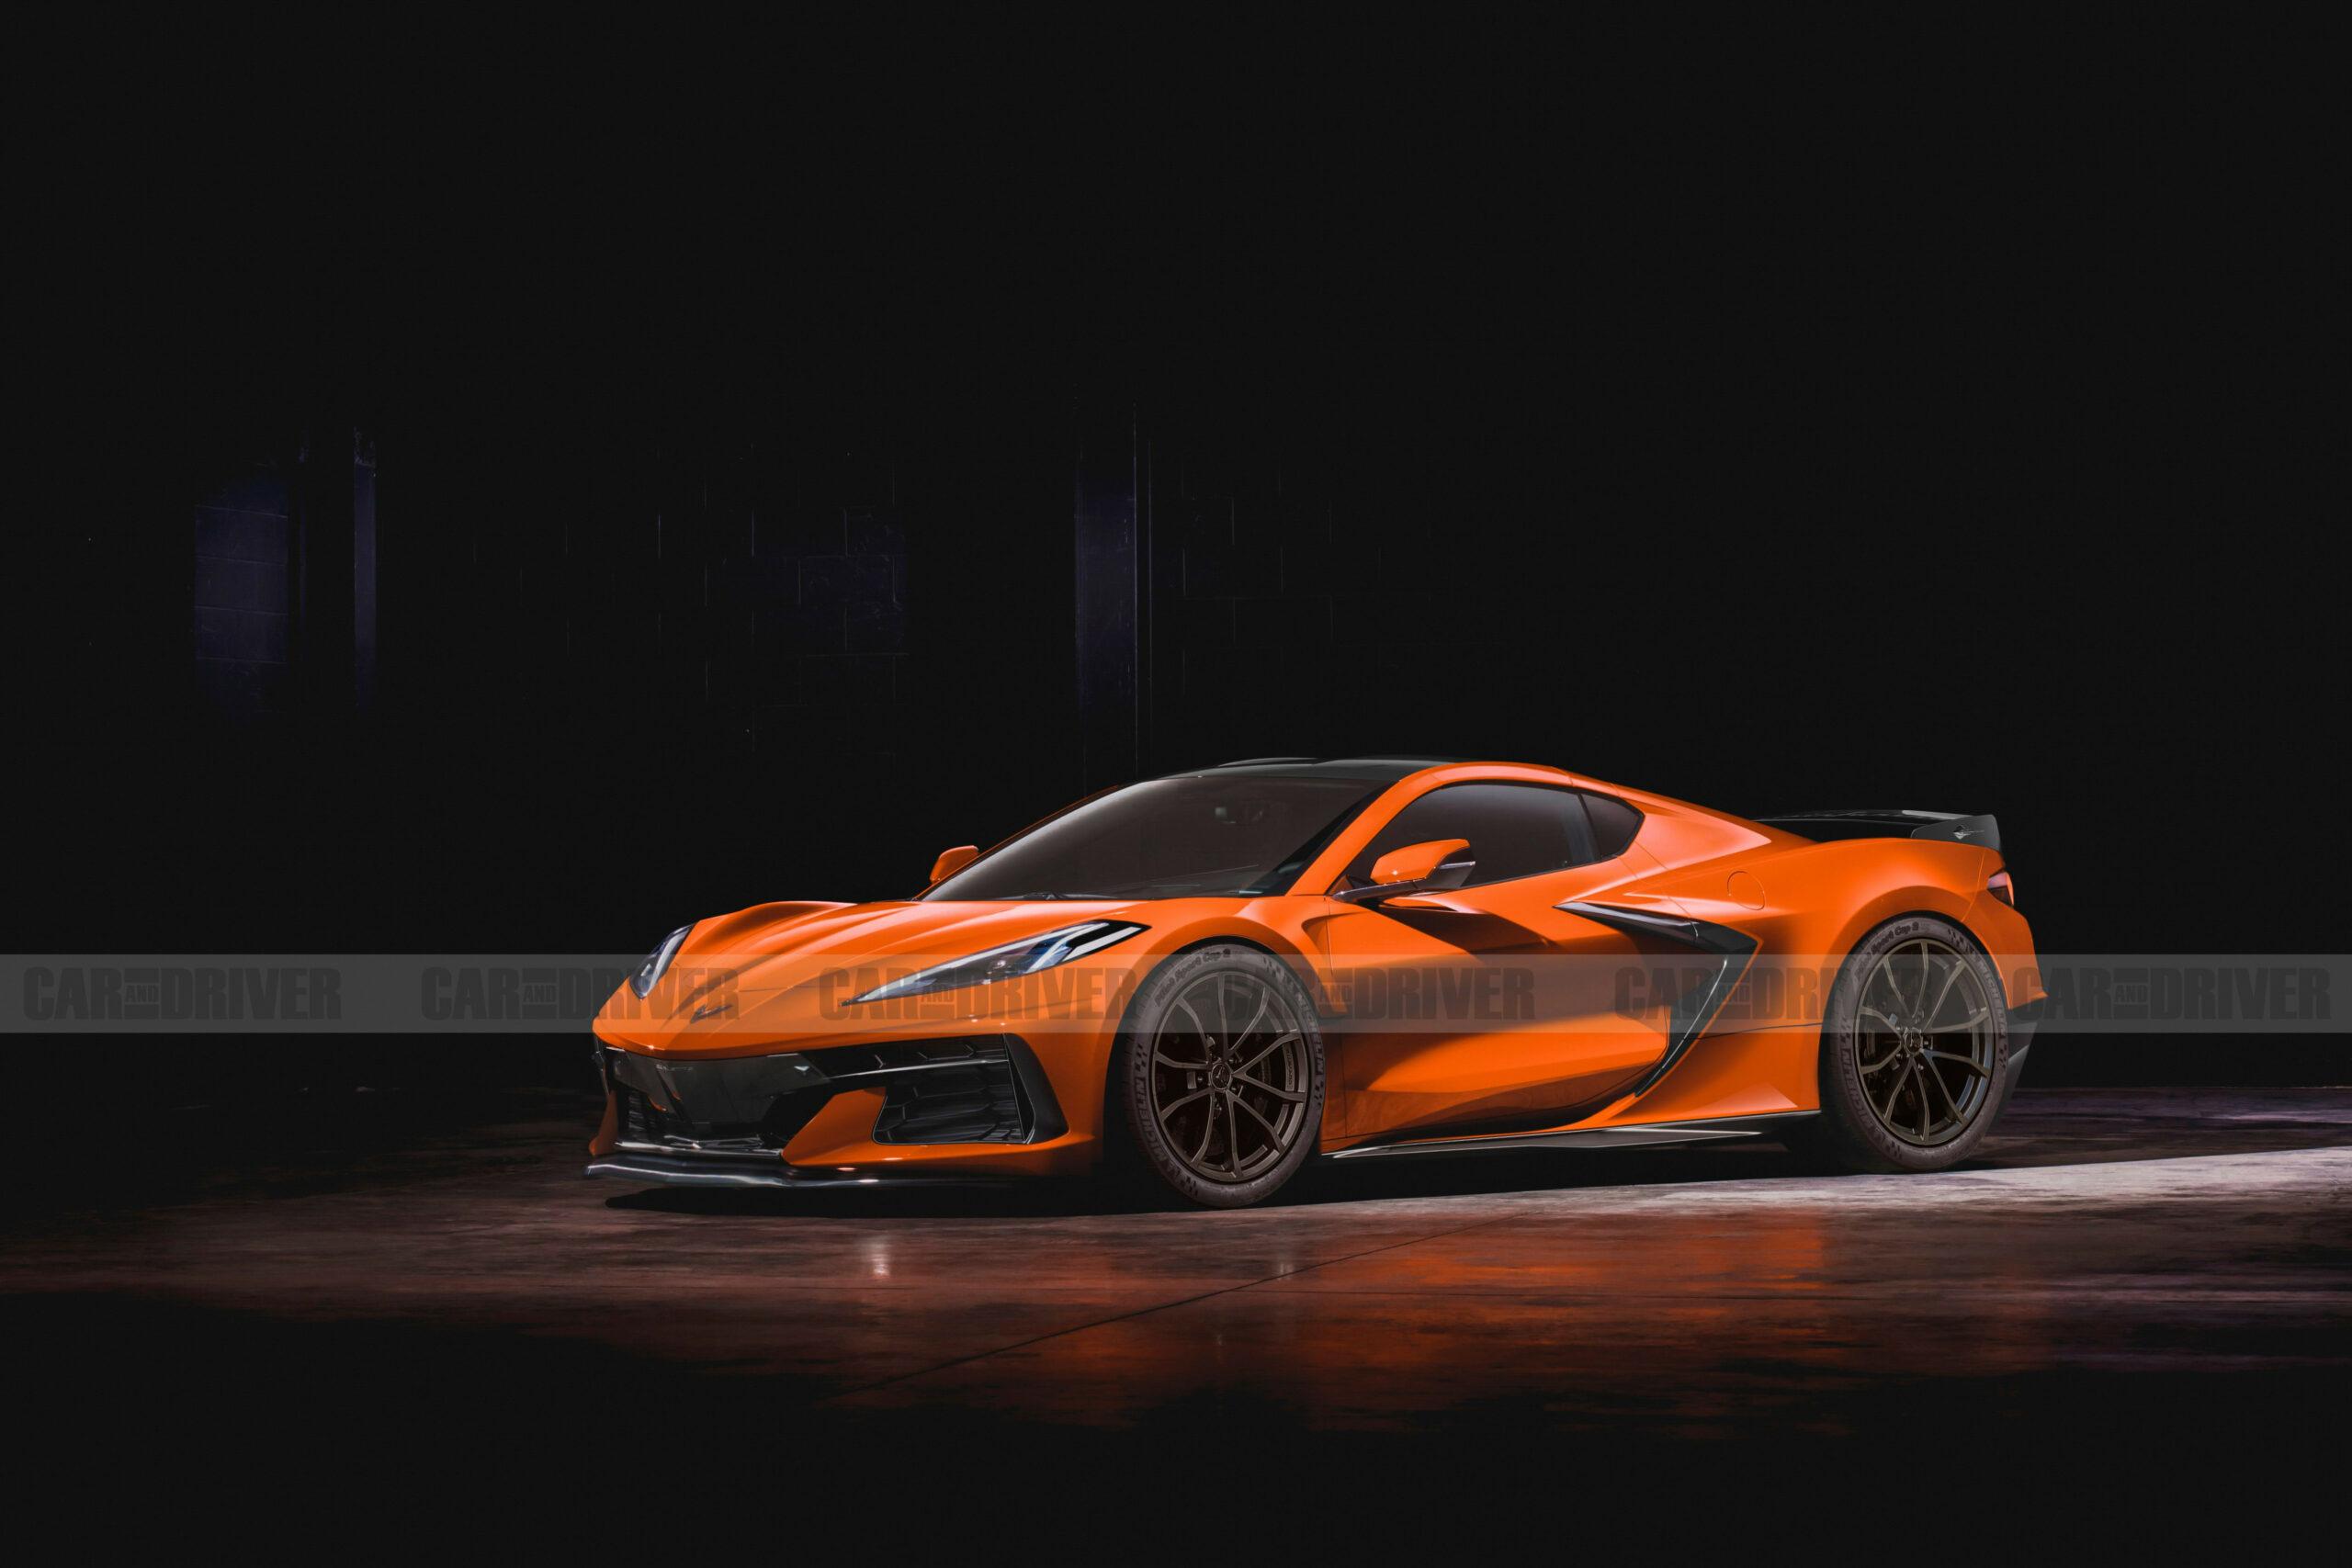 Redesign and Concept 2022 Corvette Z07